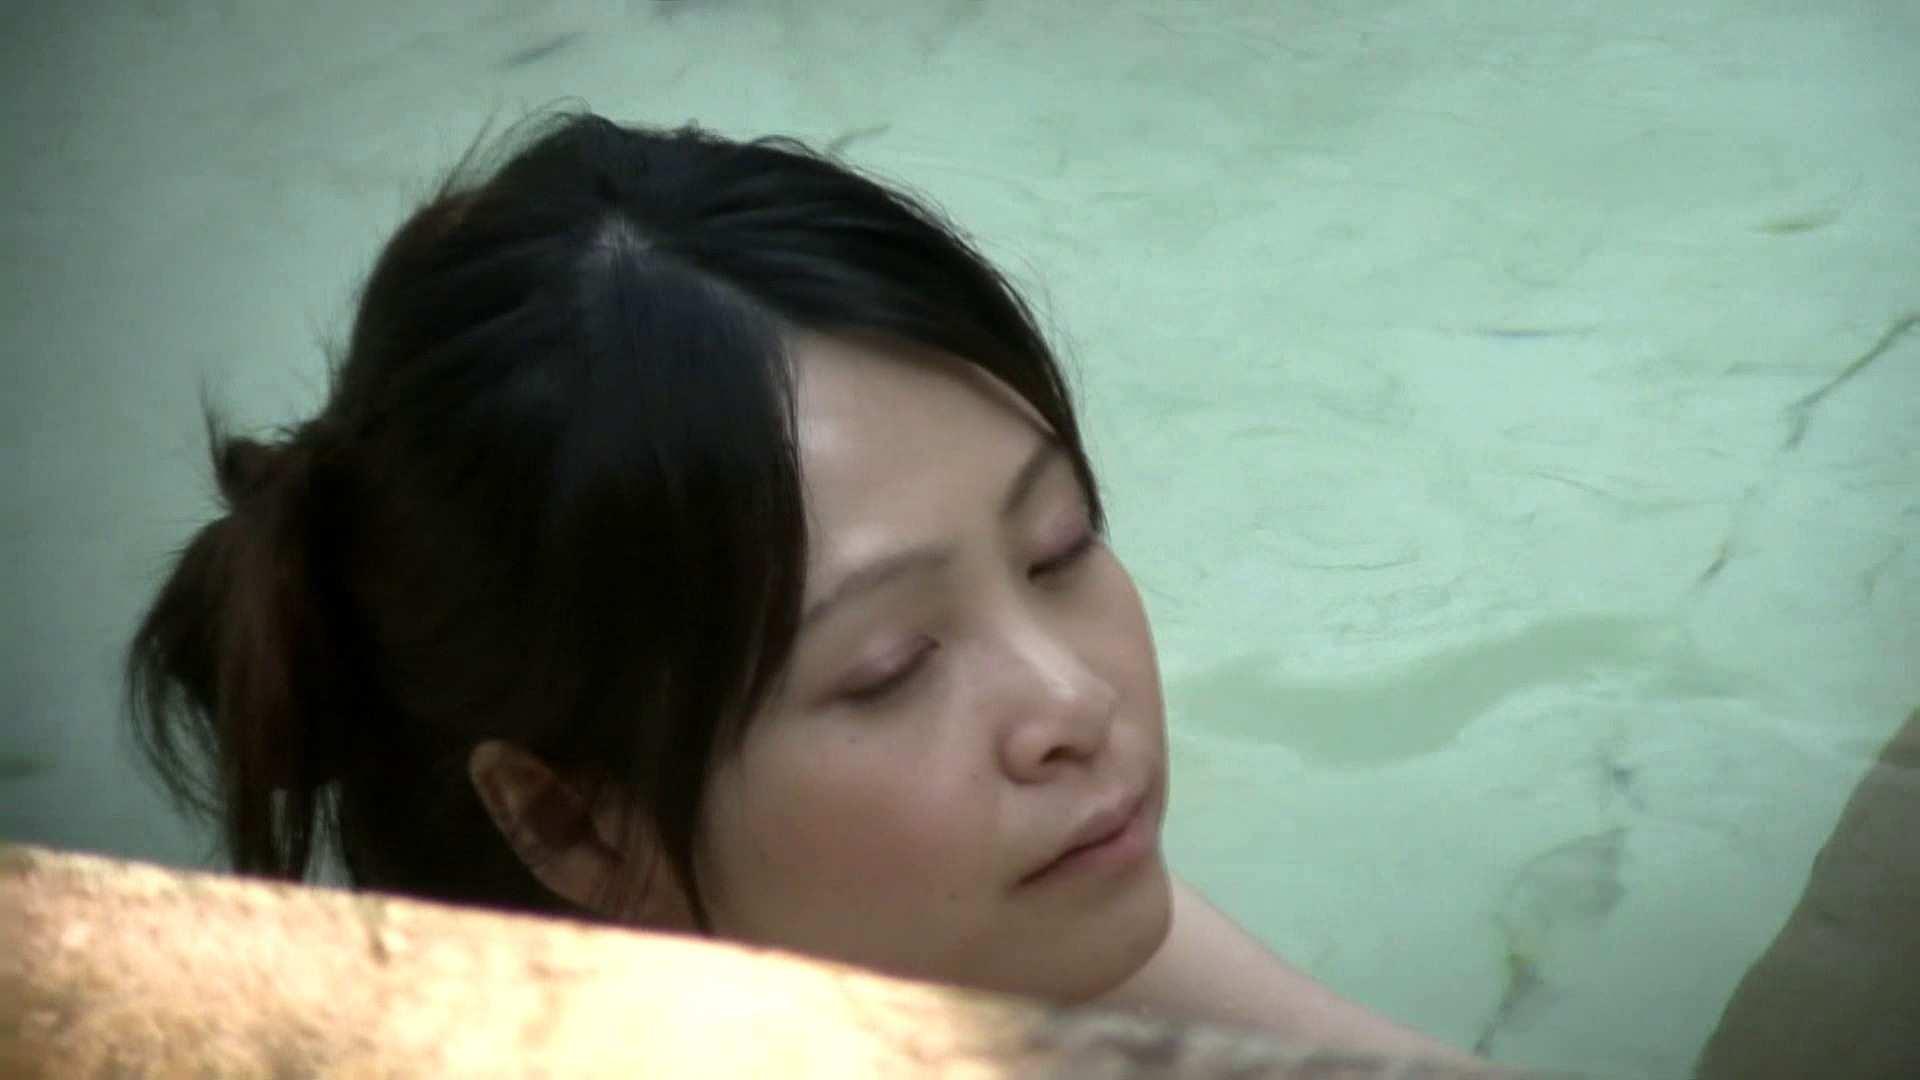 Aquaな露天風呂Vol.652 盗撮 | HなOL  105pic 13